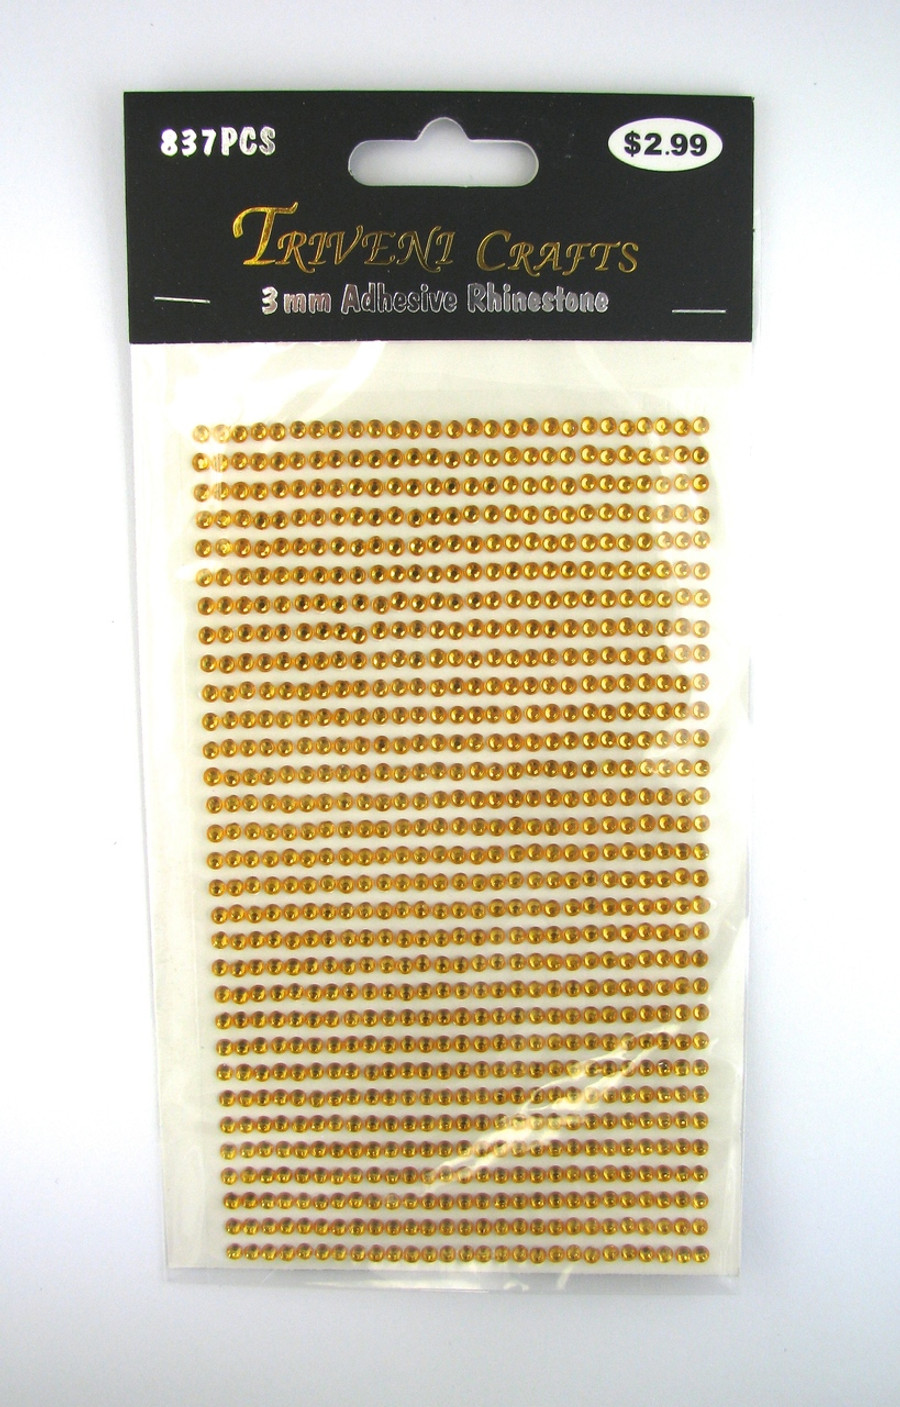 3mm Topaz Flatback Rhinestones (837 pcs) Self-Adhesive - Easy Peel Strips